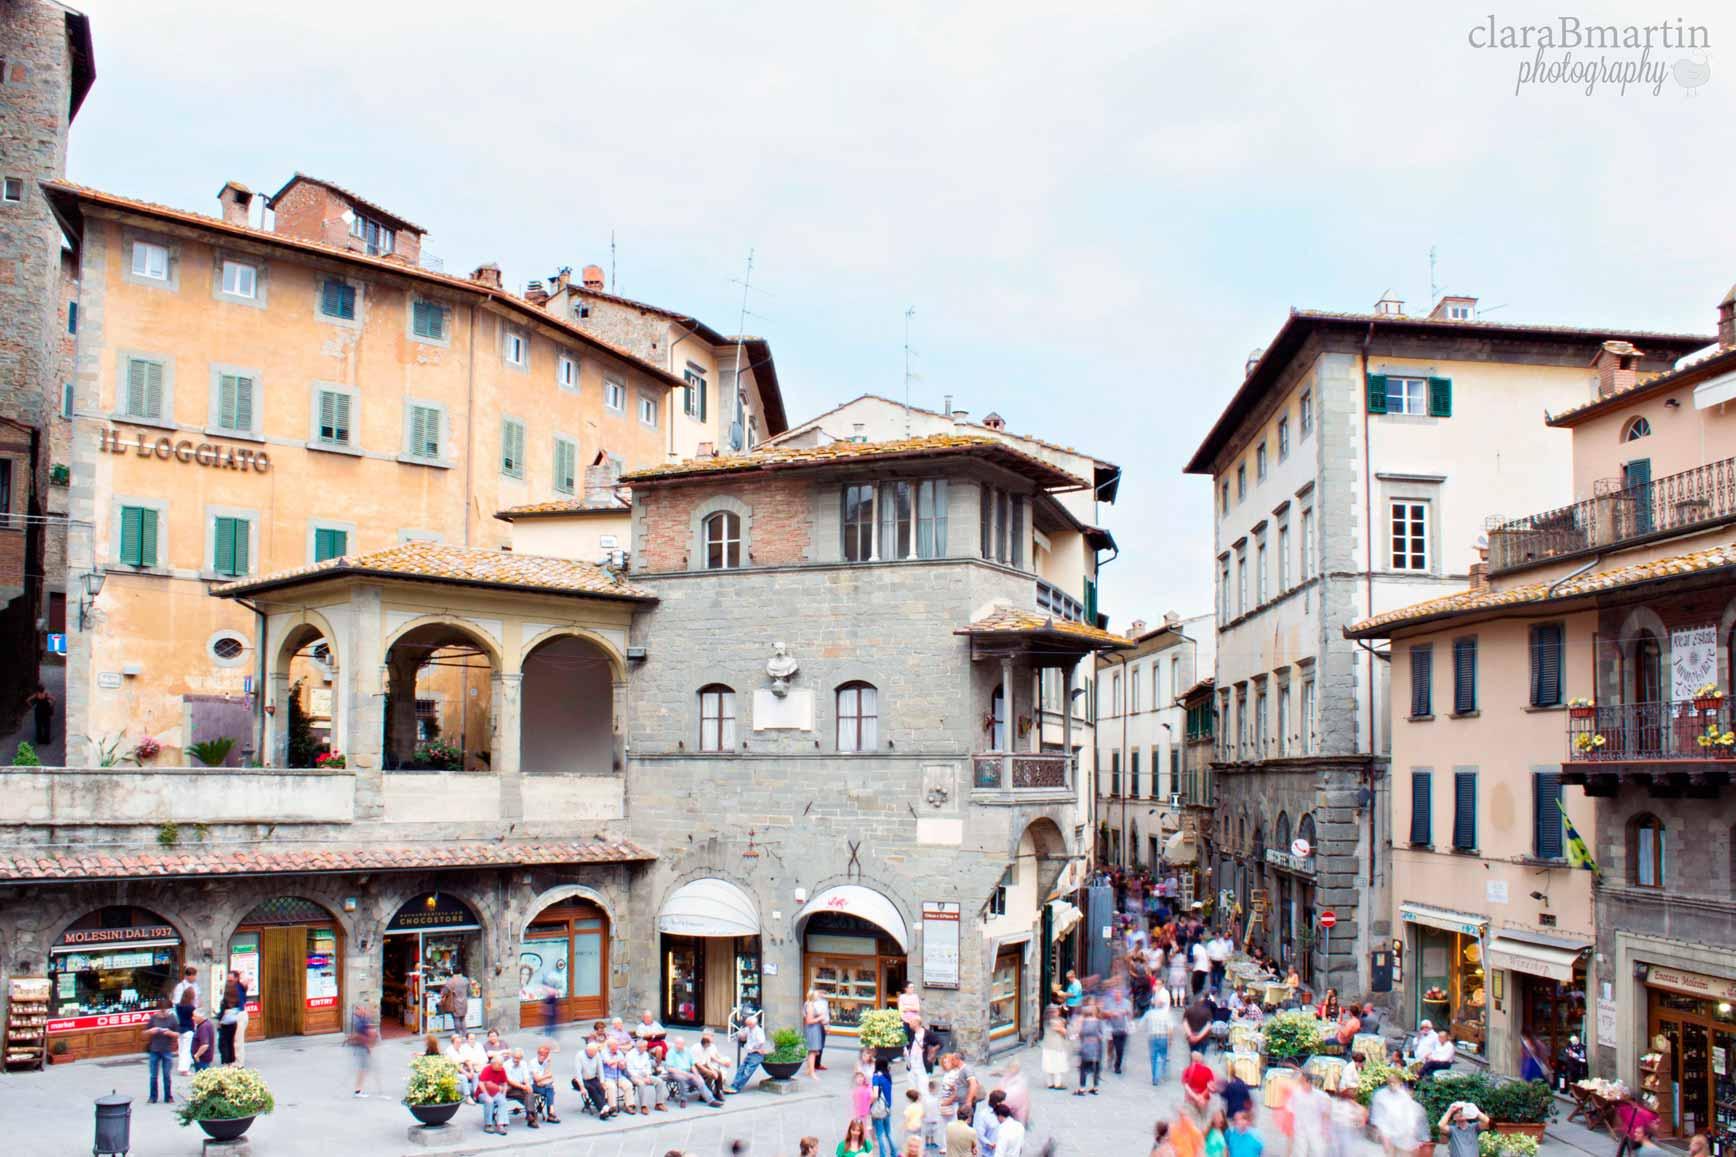 ToscanaclaraBmartin_03